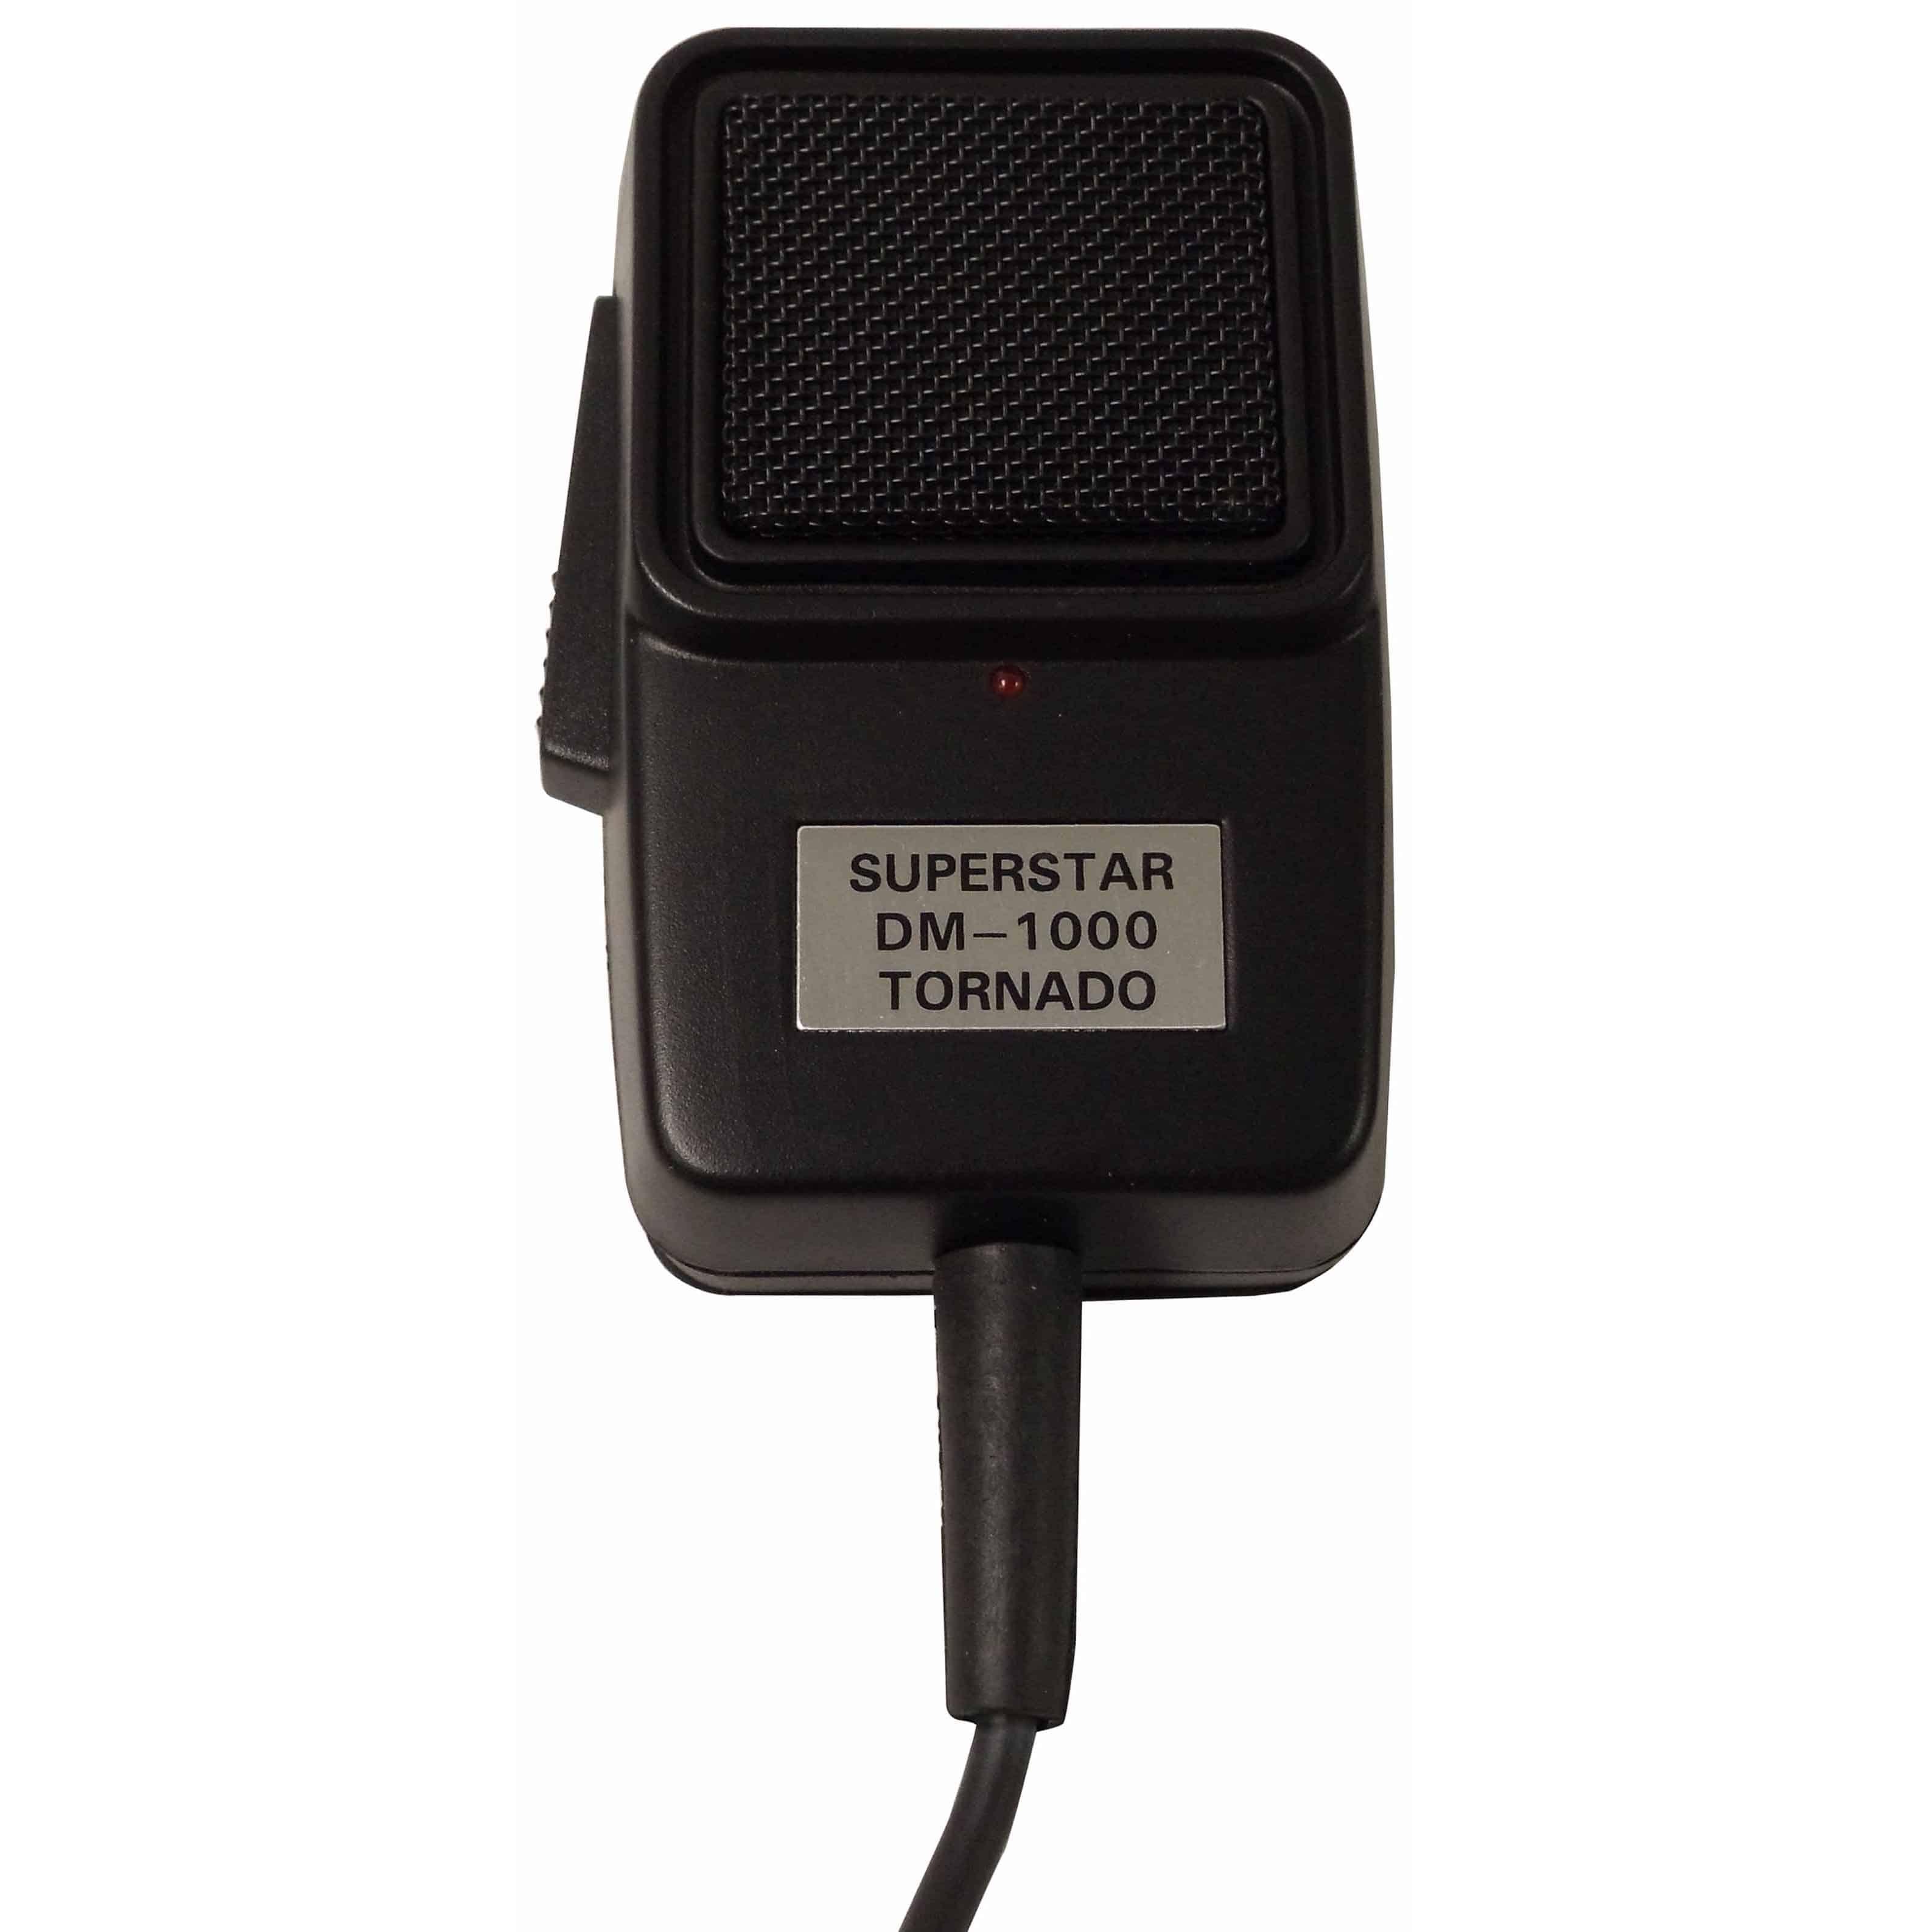 DM1000 - Superstar Tornado Echo Microphone